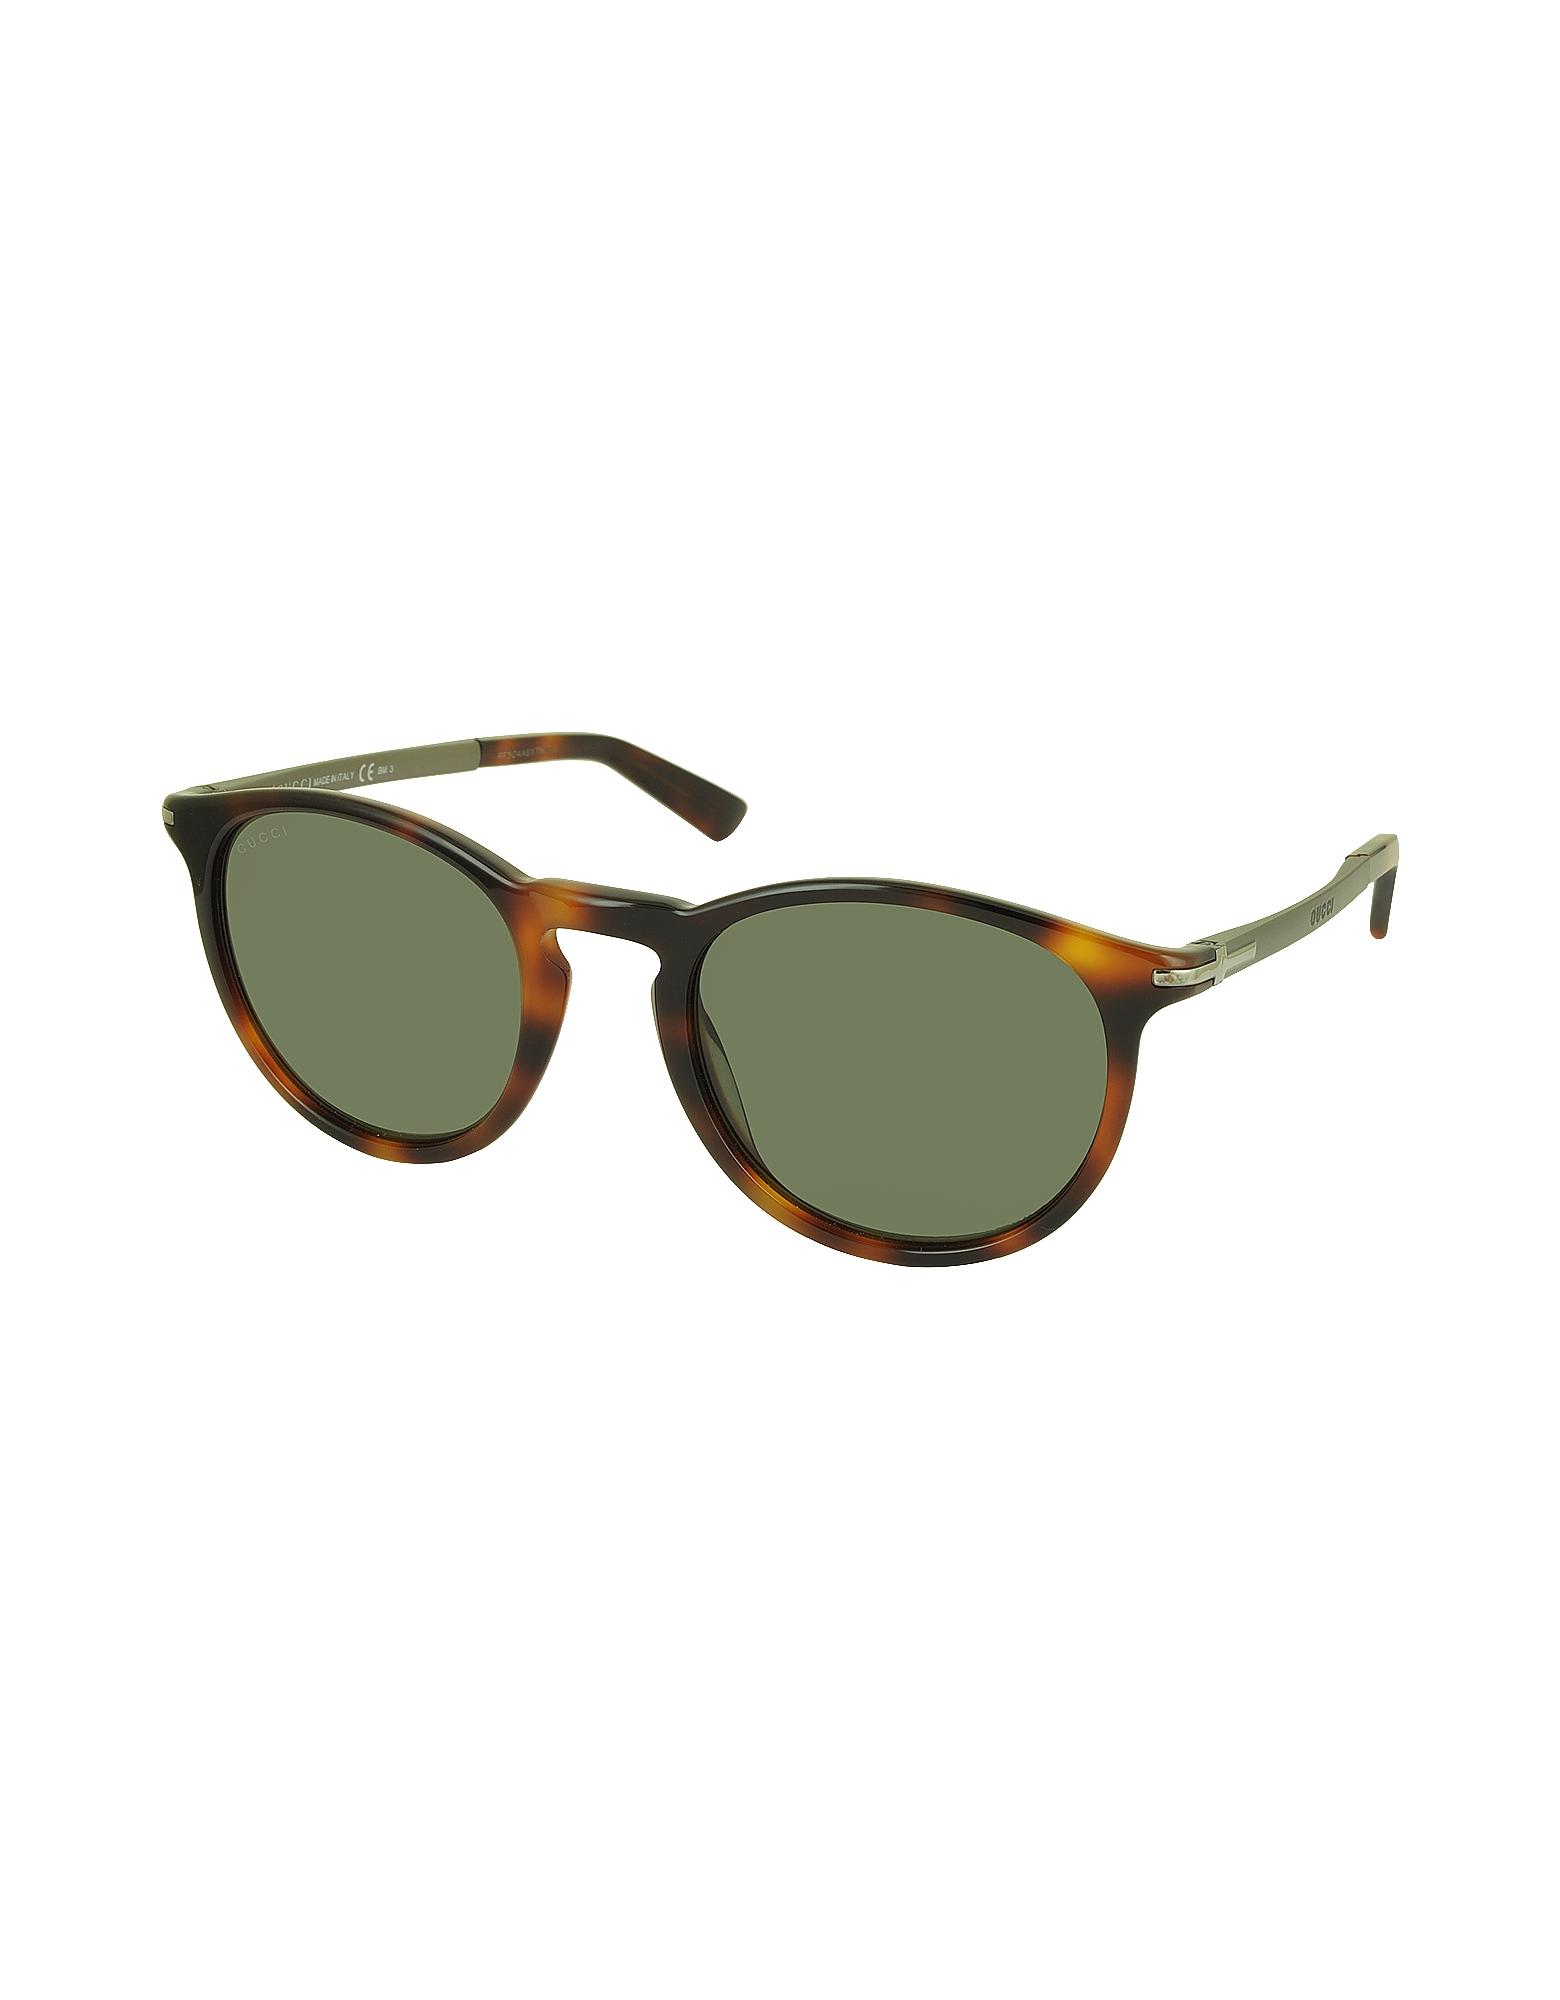 GG 1110/S 8E270 Havana Acetate Round Men's Sunglasses от Forzieri.com INT